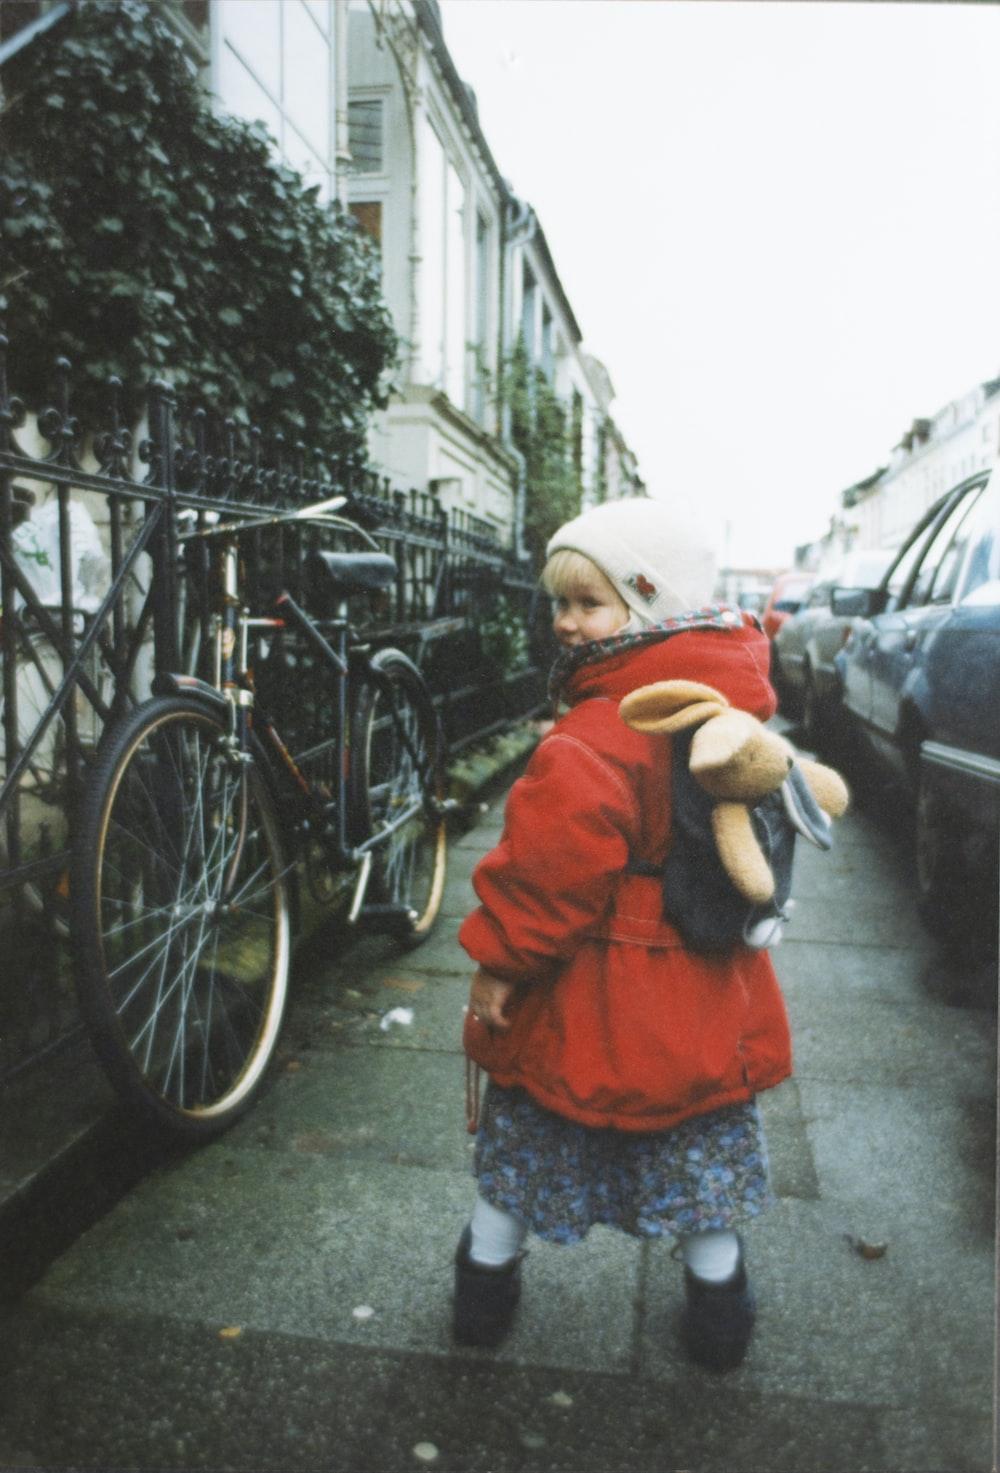 girl wearing red jacket near vehicles